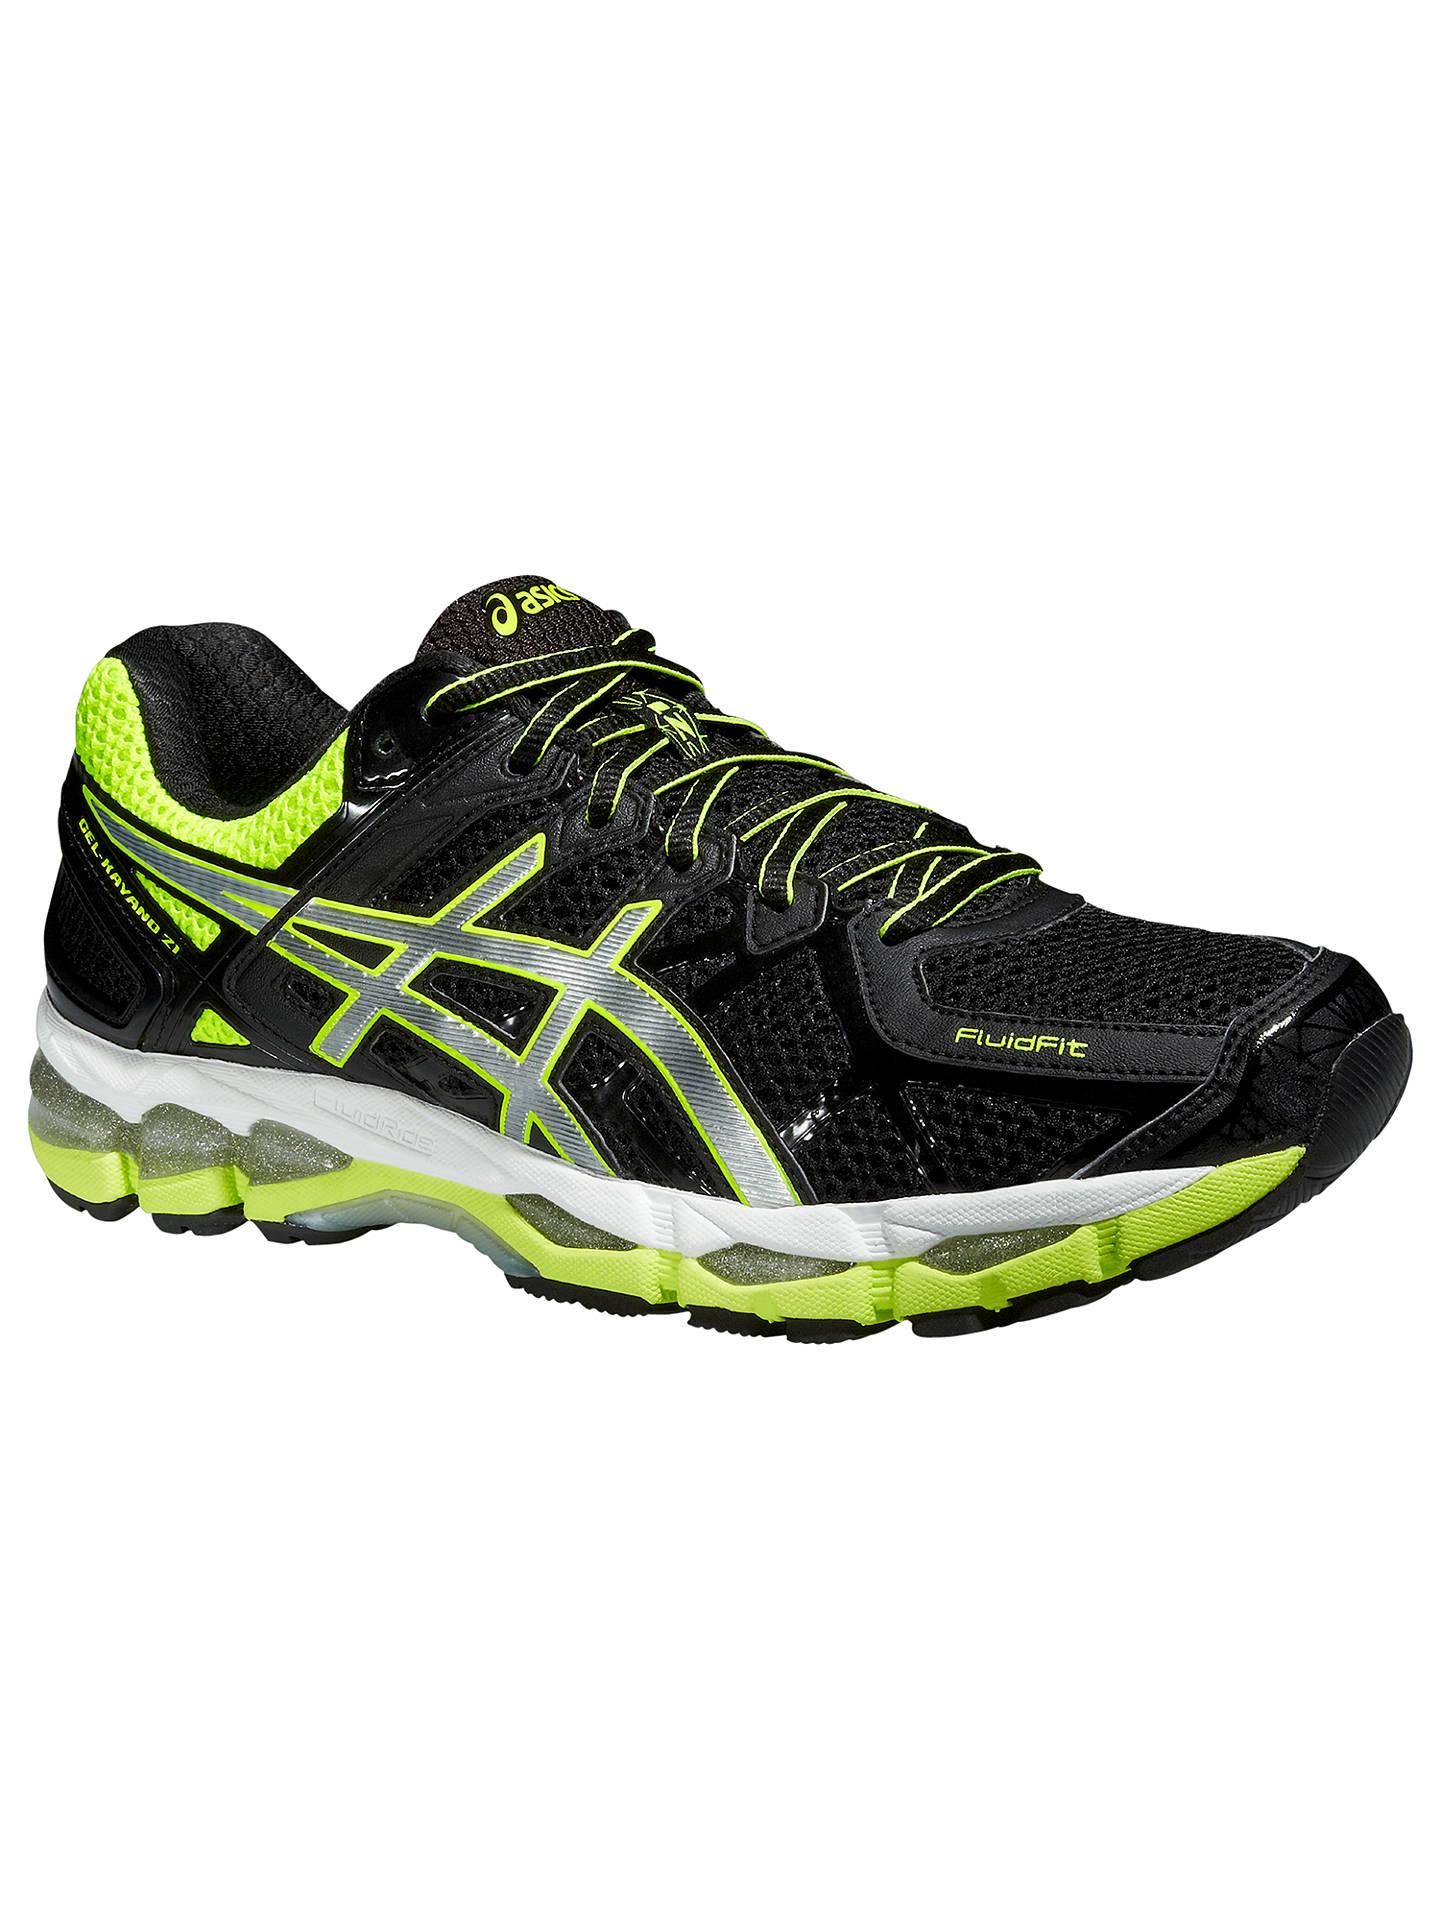 5b2523649a77 Buy Asics Gel-Kayano 21 Men s Structured Running Shoes